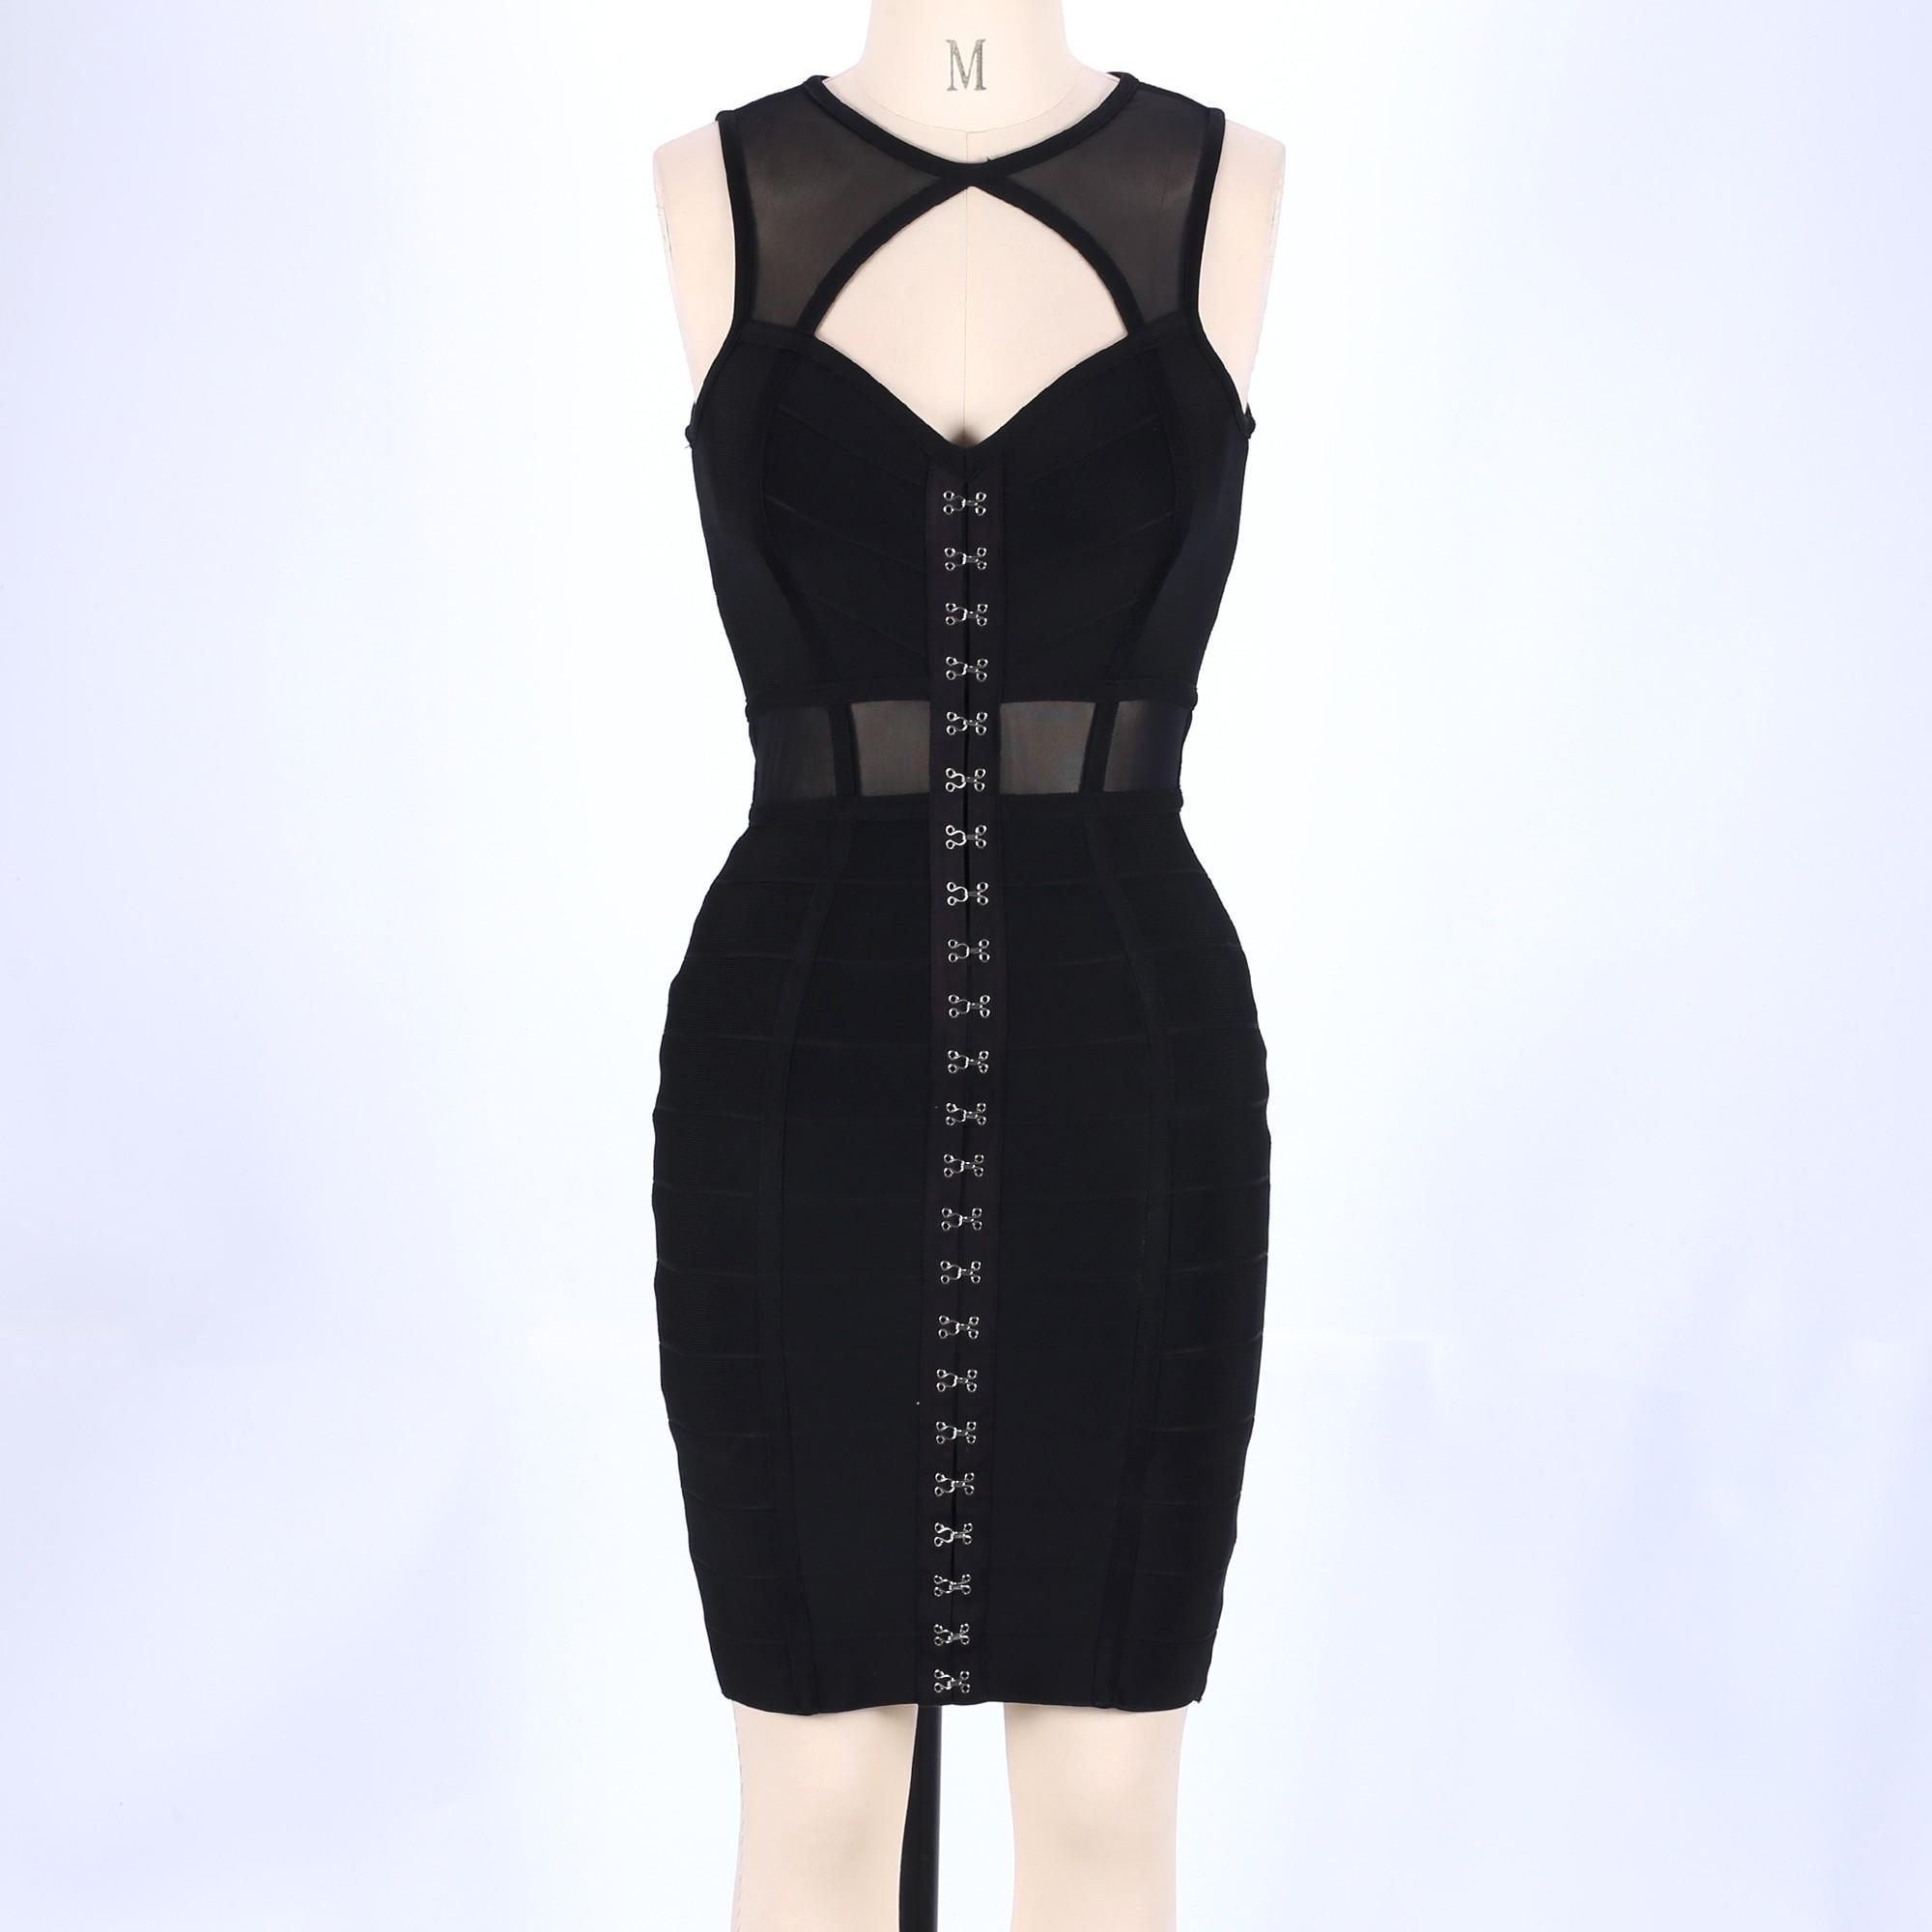 Rayon - Black Round Neck Sleeveless Mini Mesh Cut Out Party Bandage Dress HJ457-Black